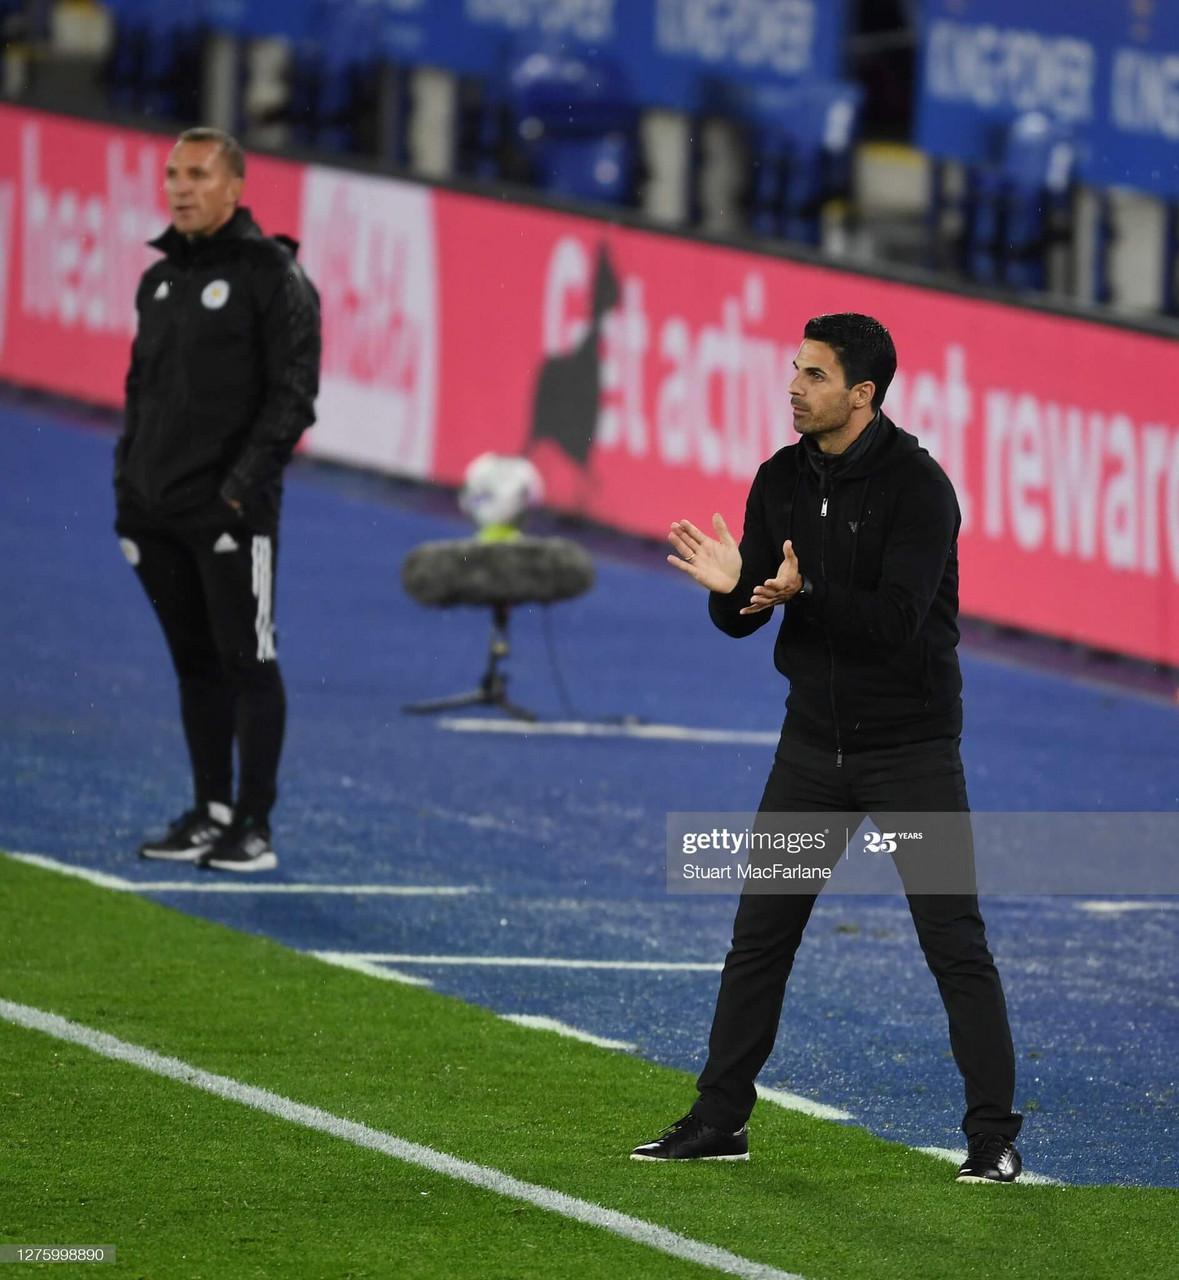 Arsenal vs Leicester City: Talking Tactics